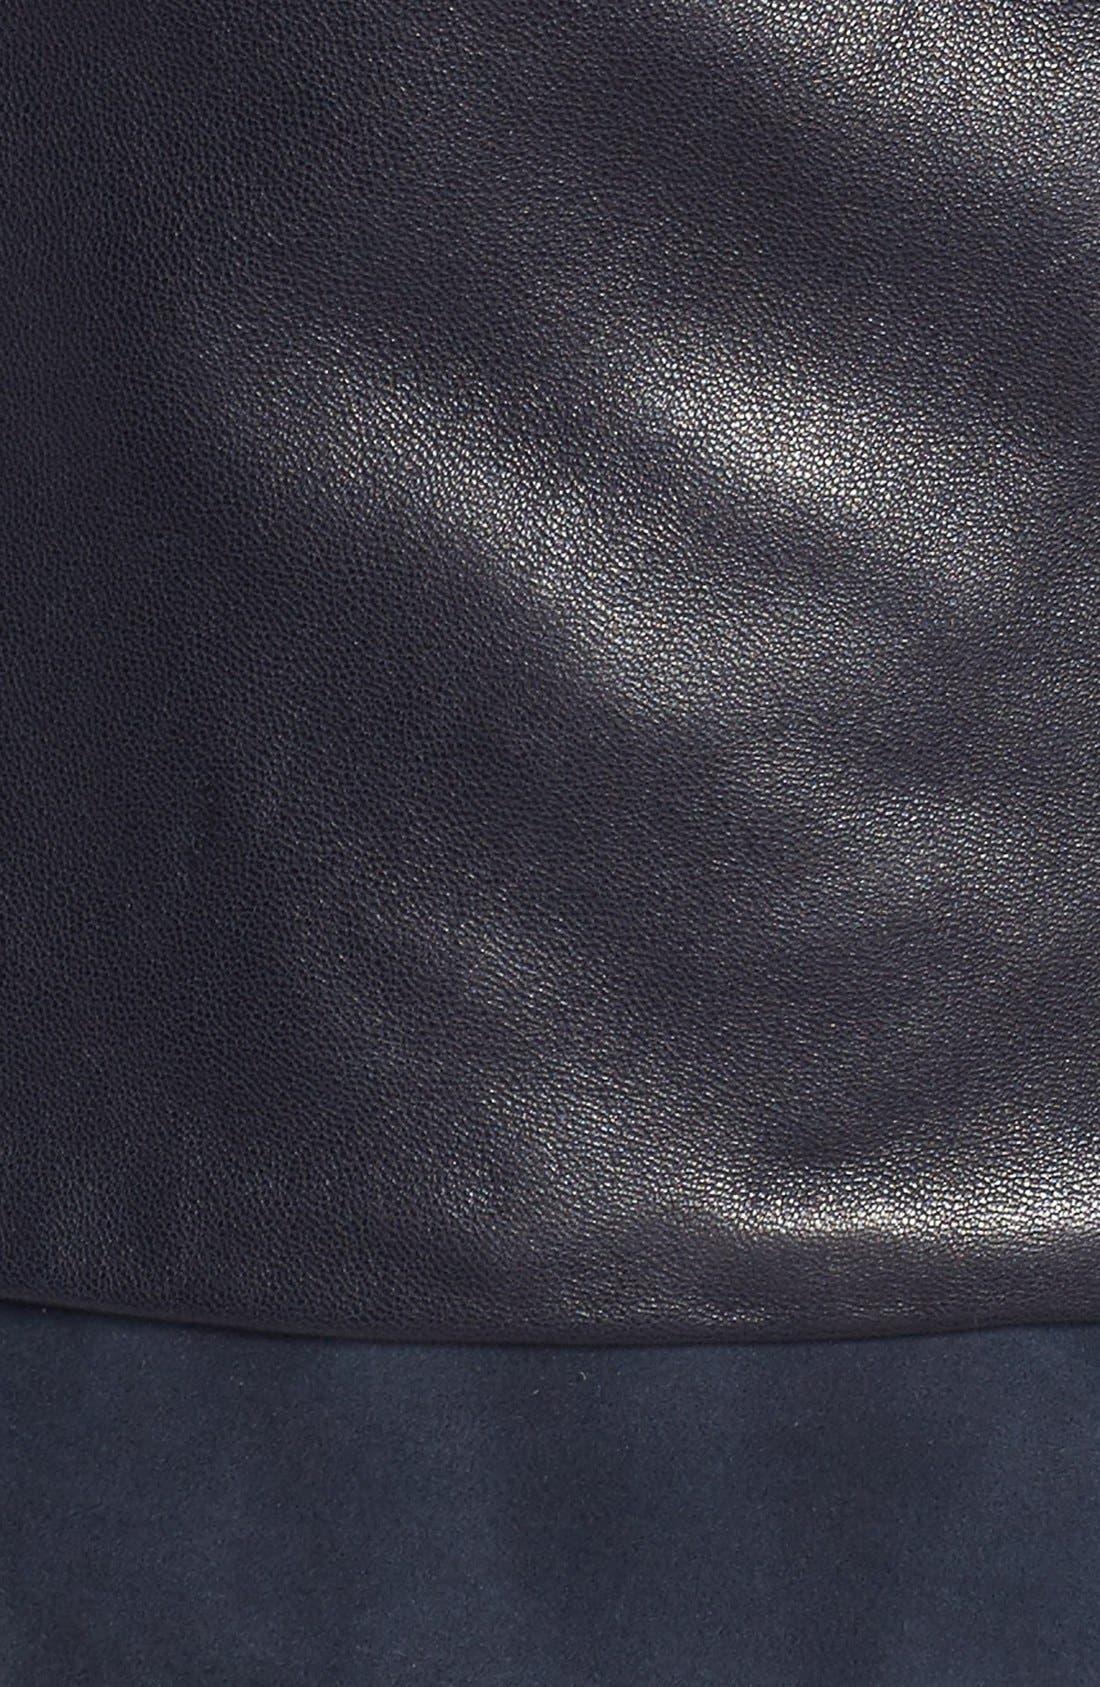 Mixed Media Leather Moto Jacket,                             Alternate thumbnail 10, color,